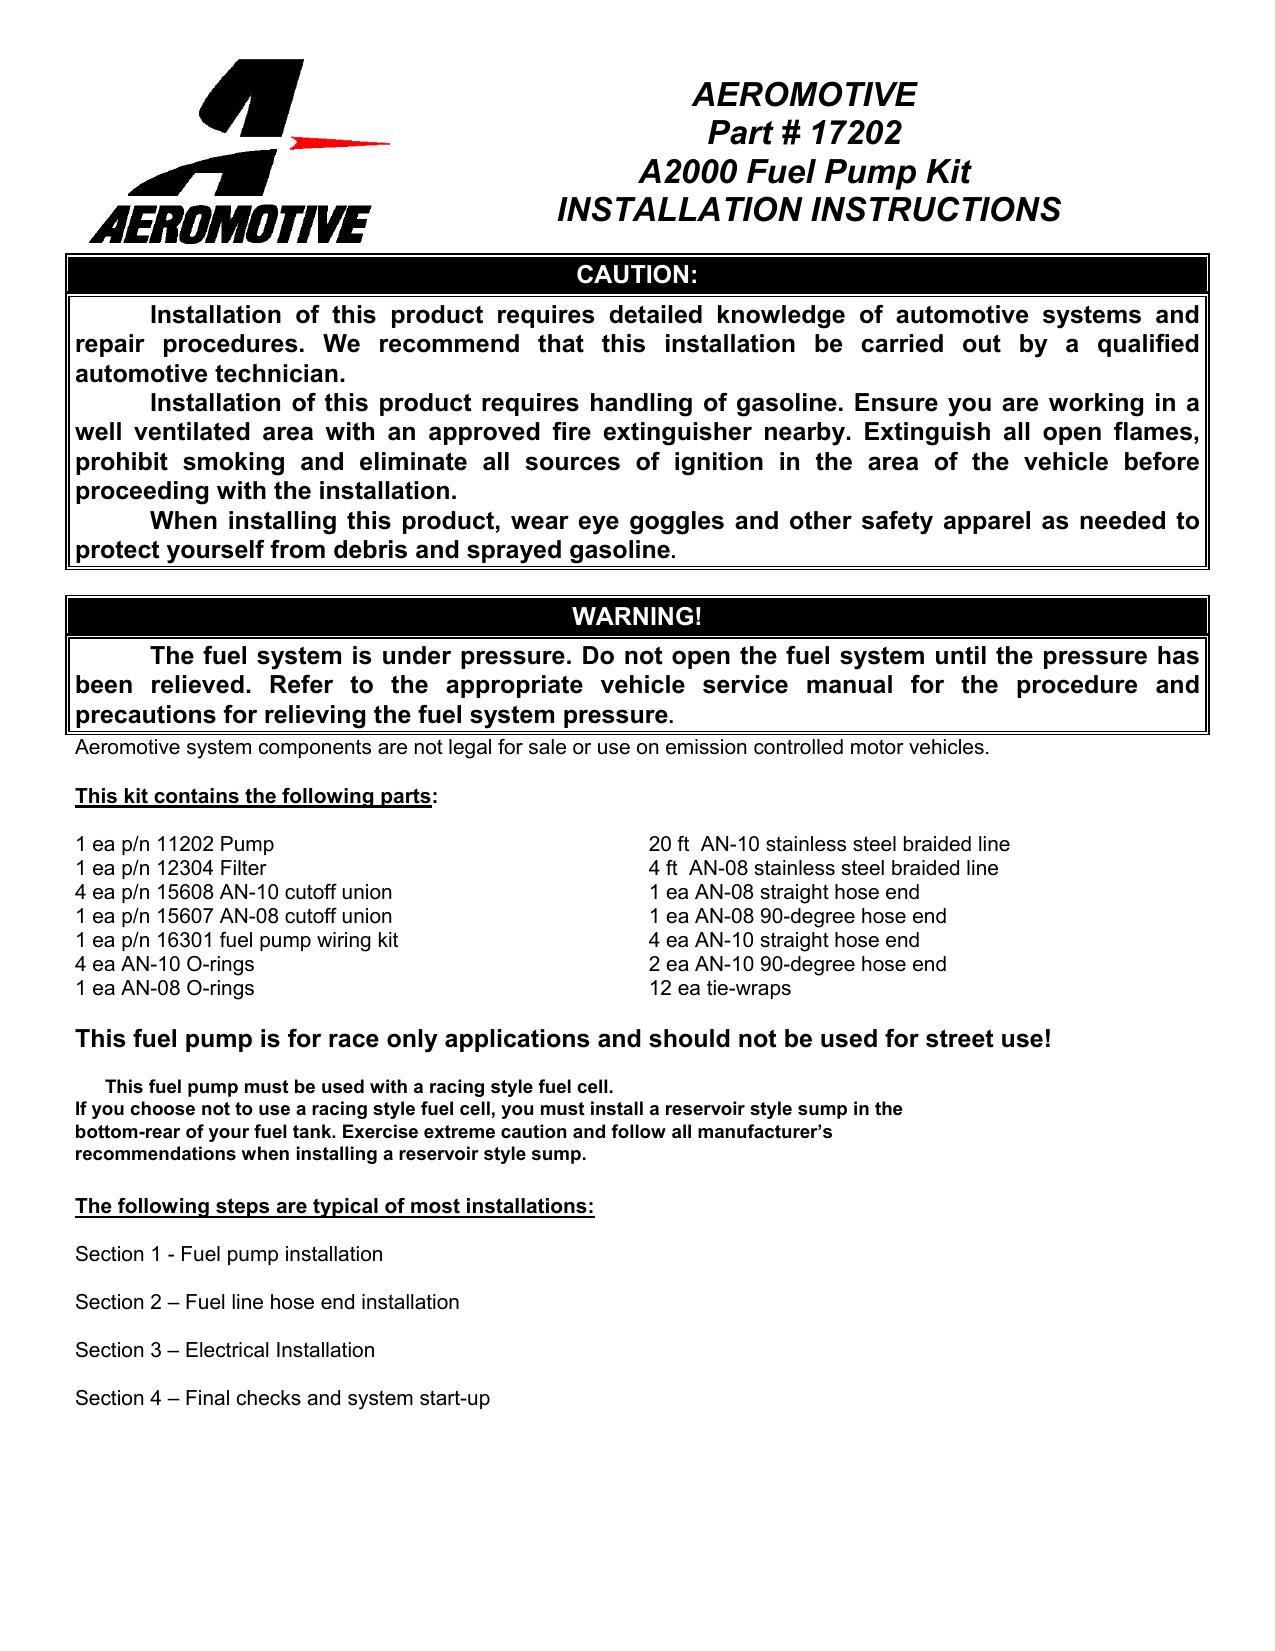 Aeromotive 5 Blade Relay Wiring Diagram Data Diagrams Pin Fuel Pump Part 17202 A2000 Kit Manualzz Com Rh 8